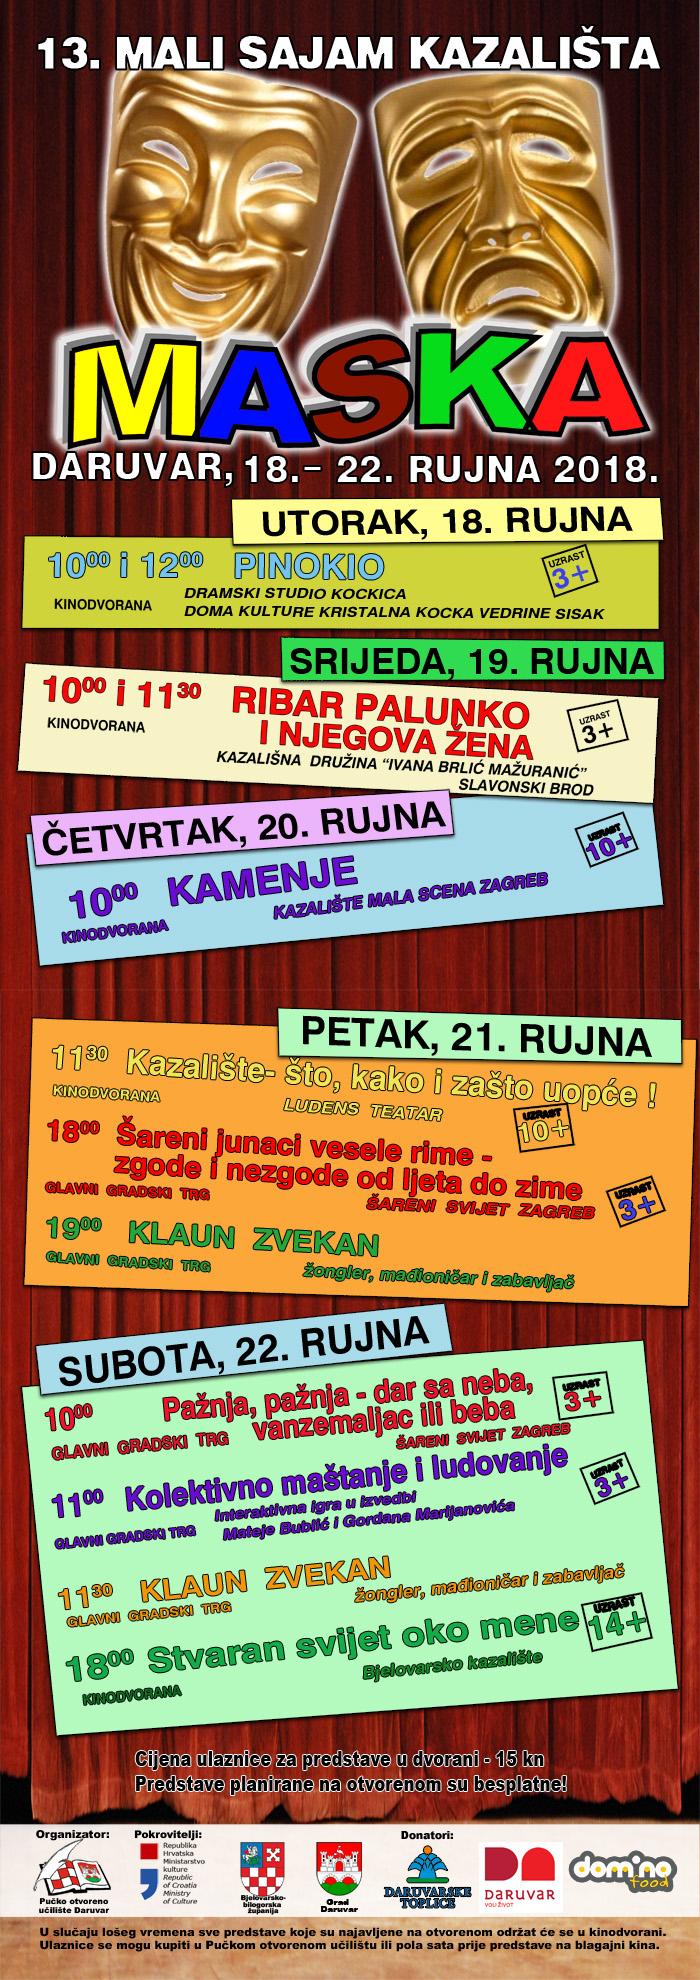 13. MASKA-plakat s programom